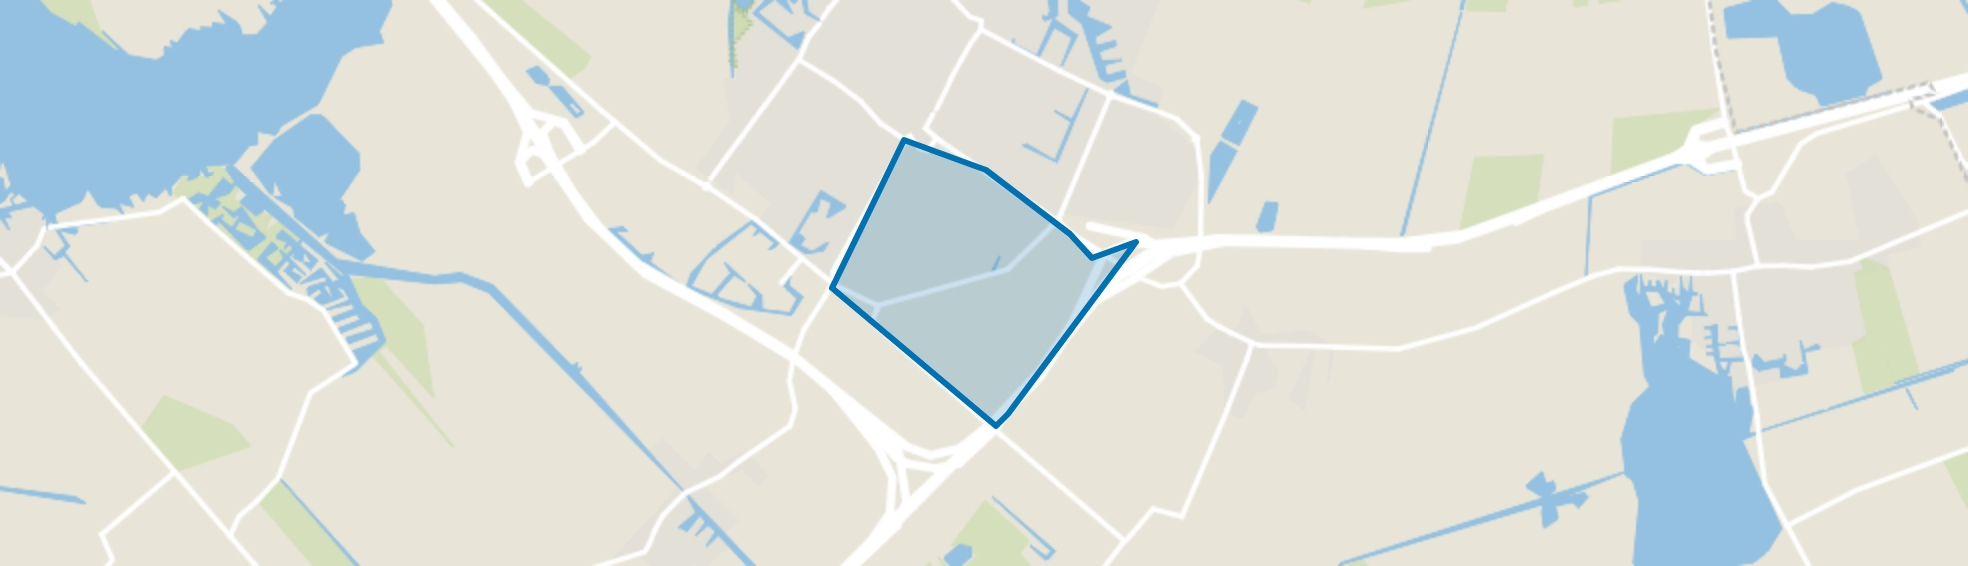 Joure, Zuiderveld, Joure map